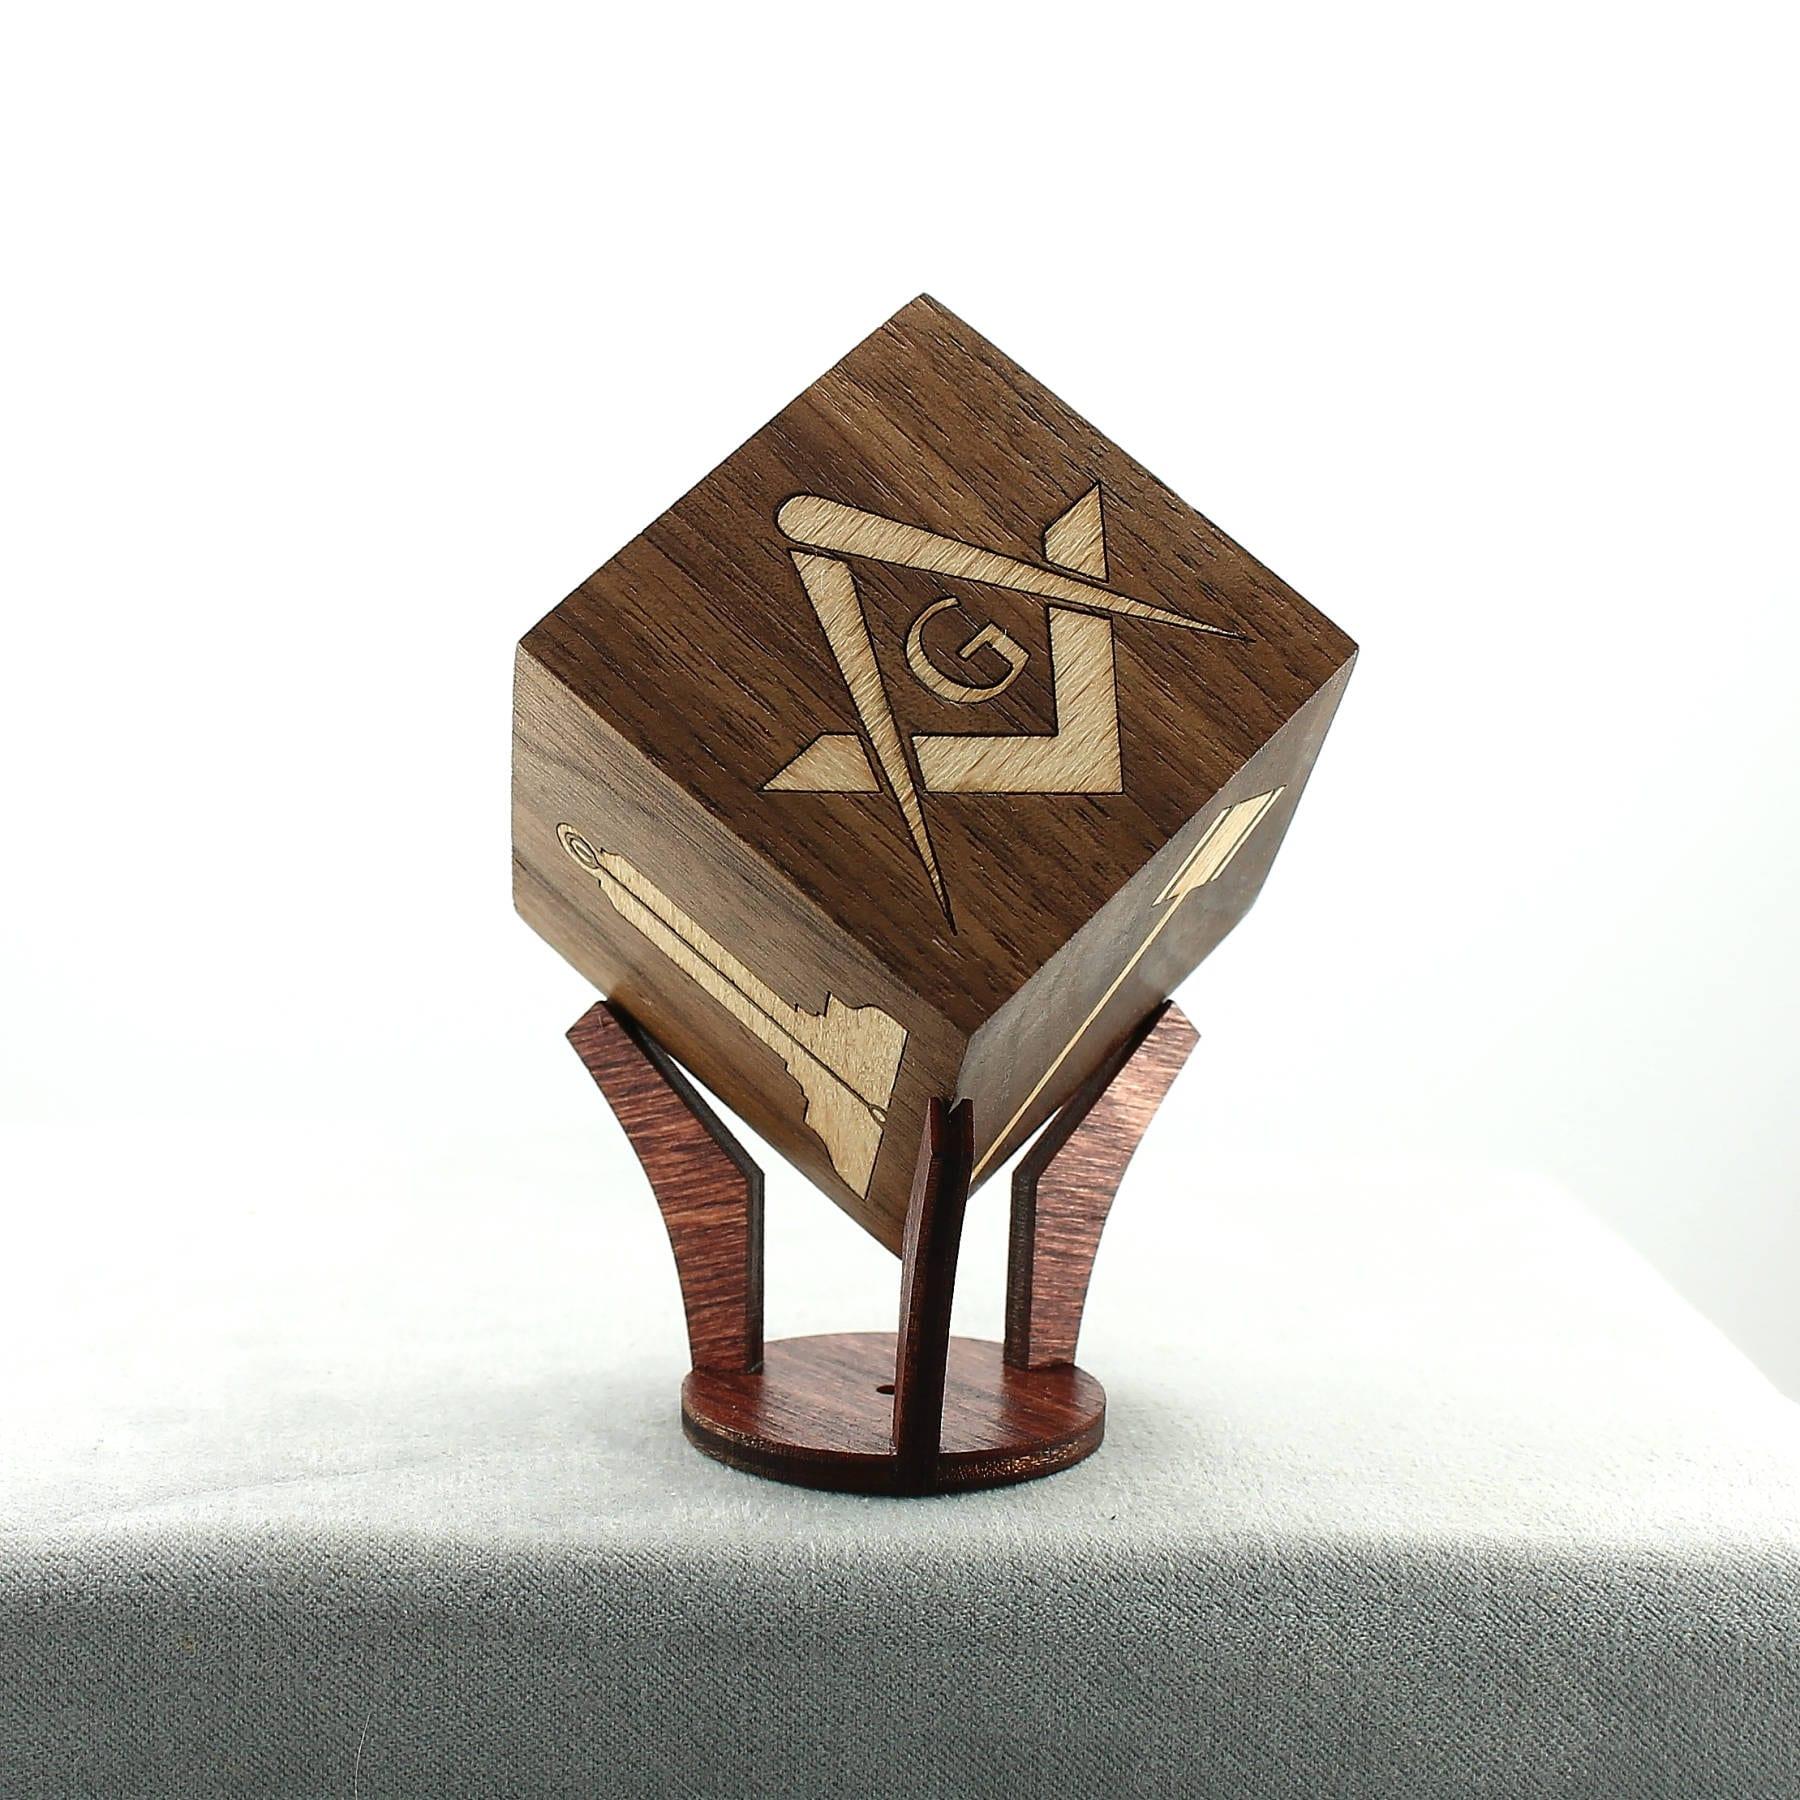 Masonic Wood Inlaid Cube Working Tools